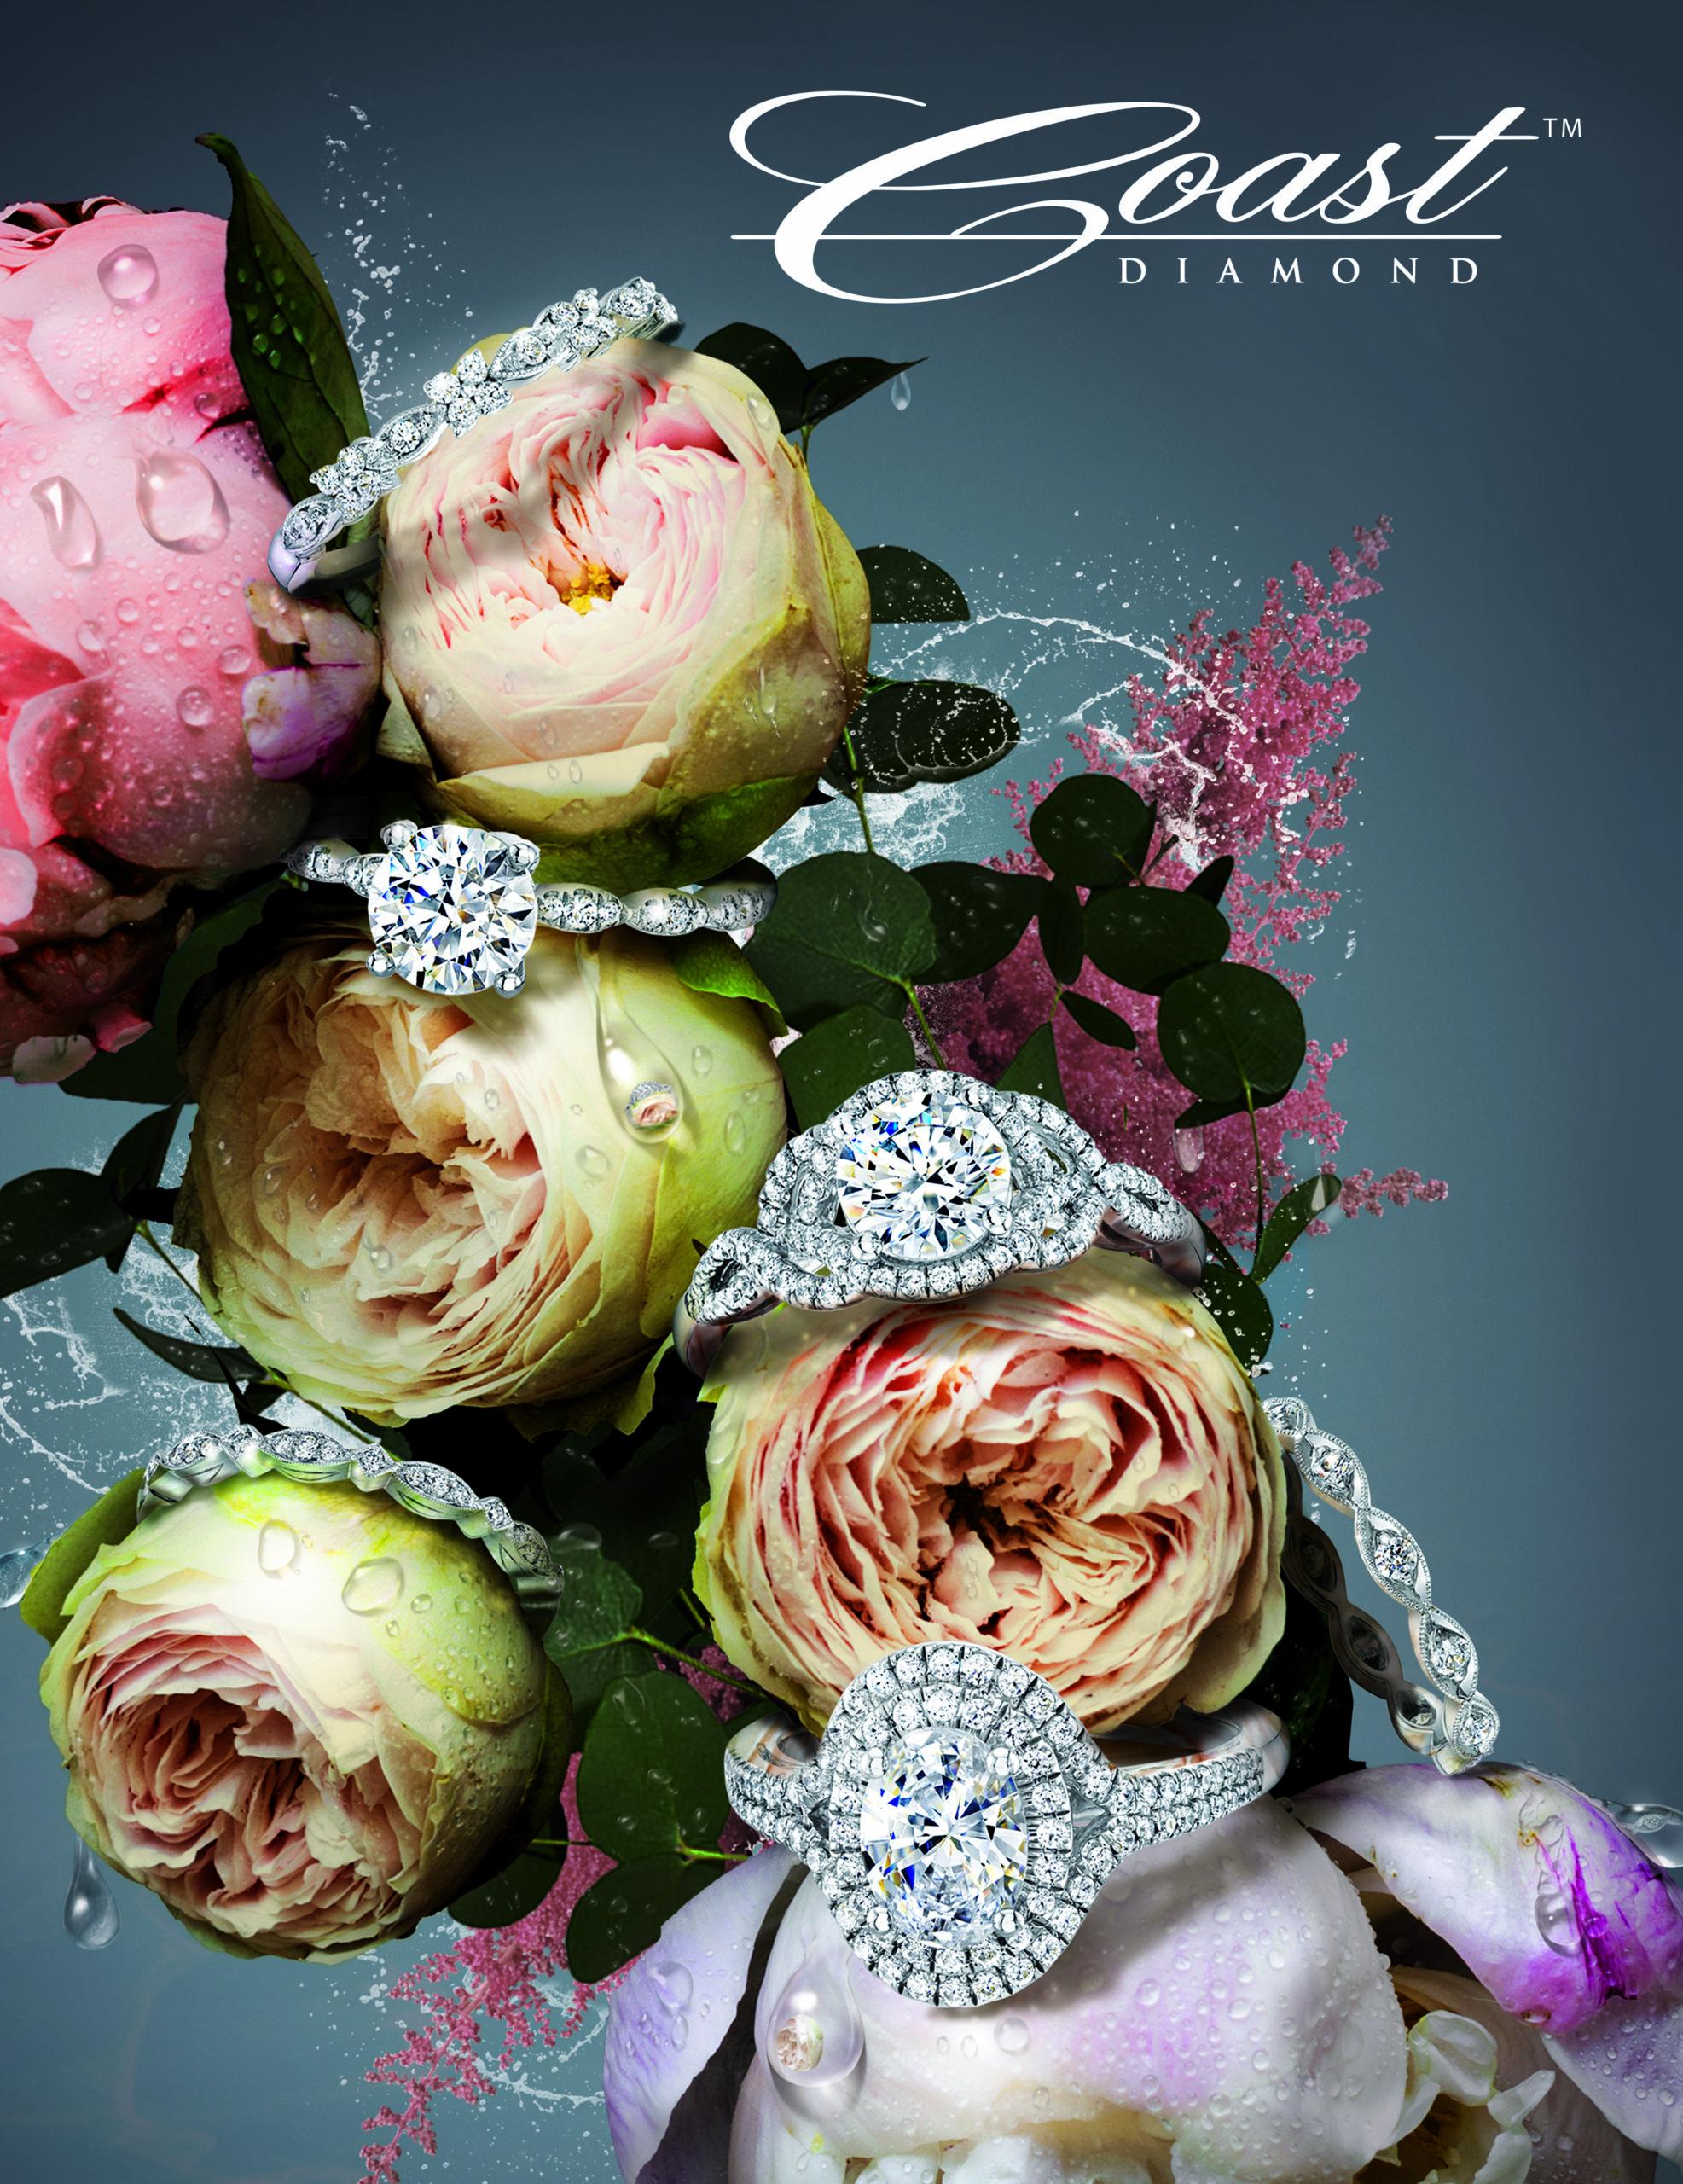 diamond bridal, engagement rings, diamond halo,